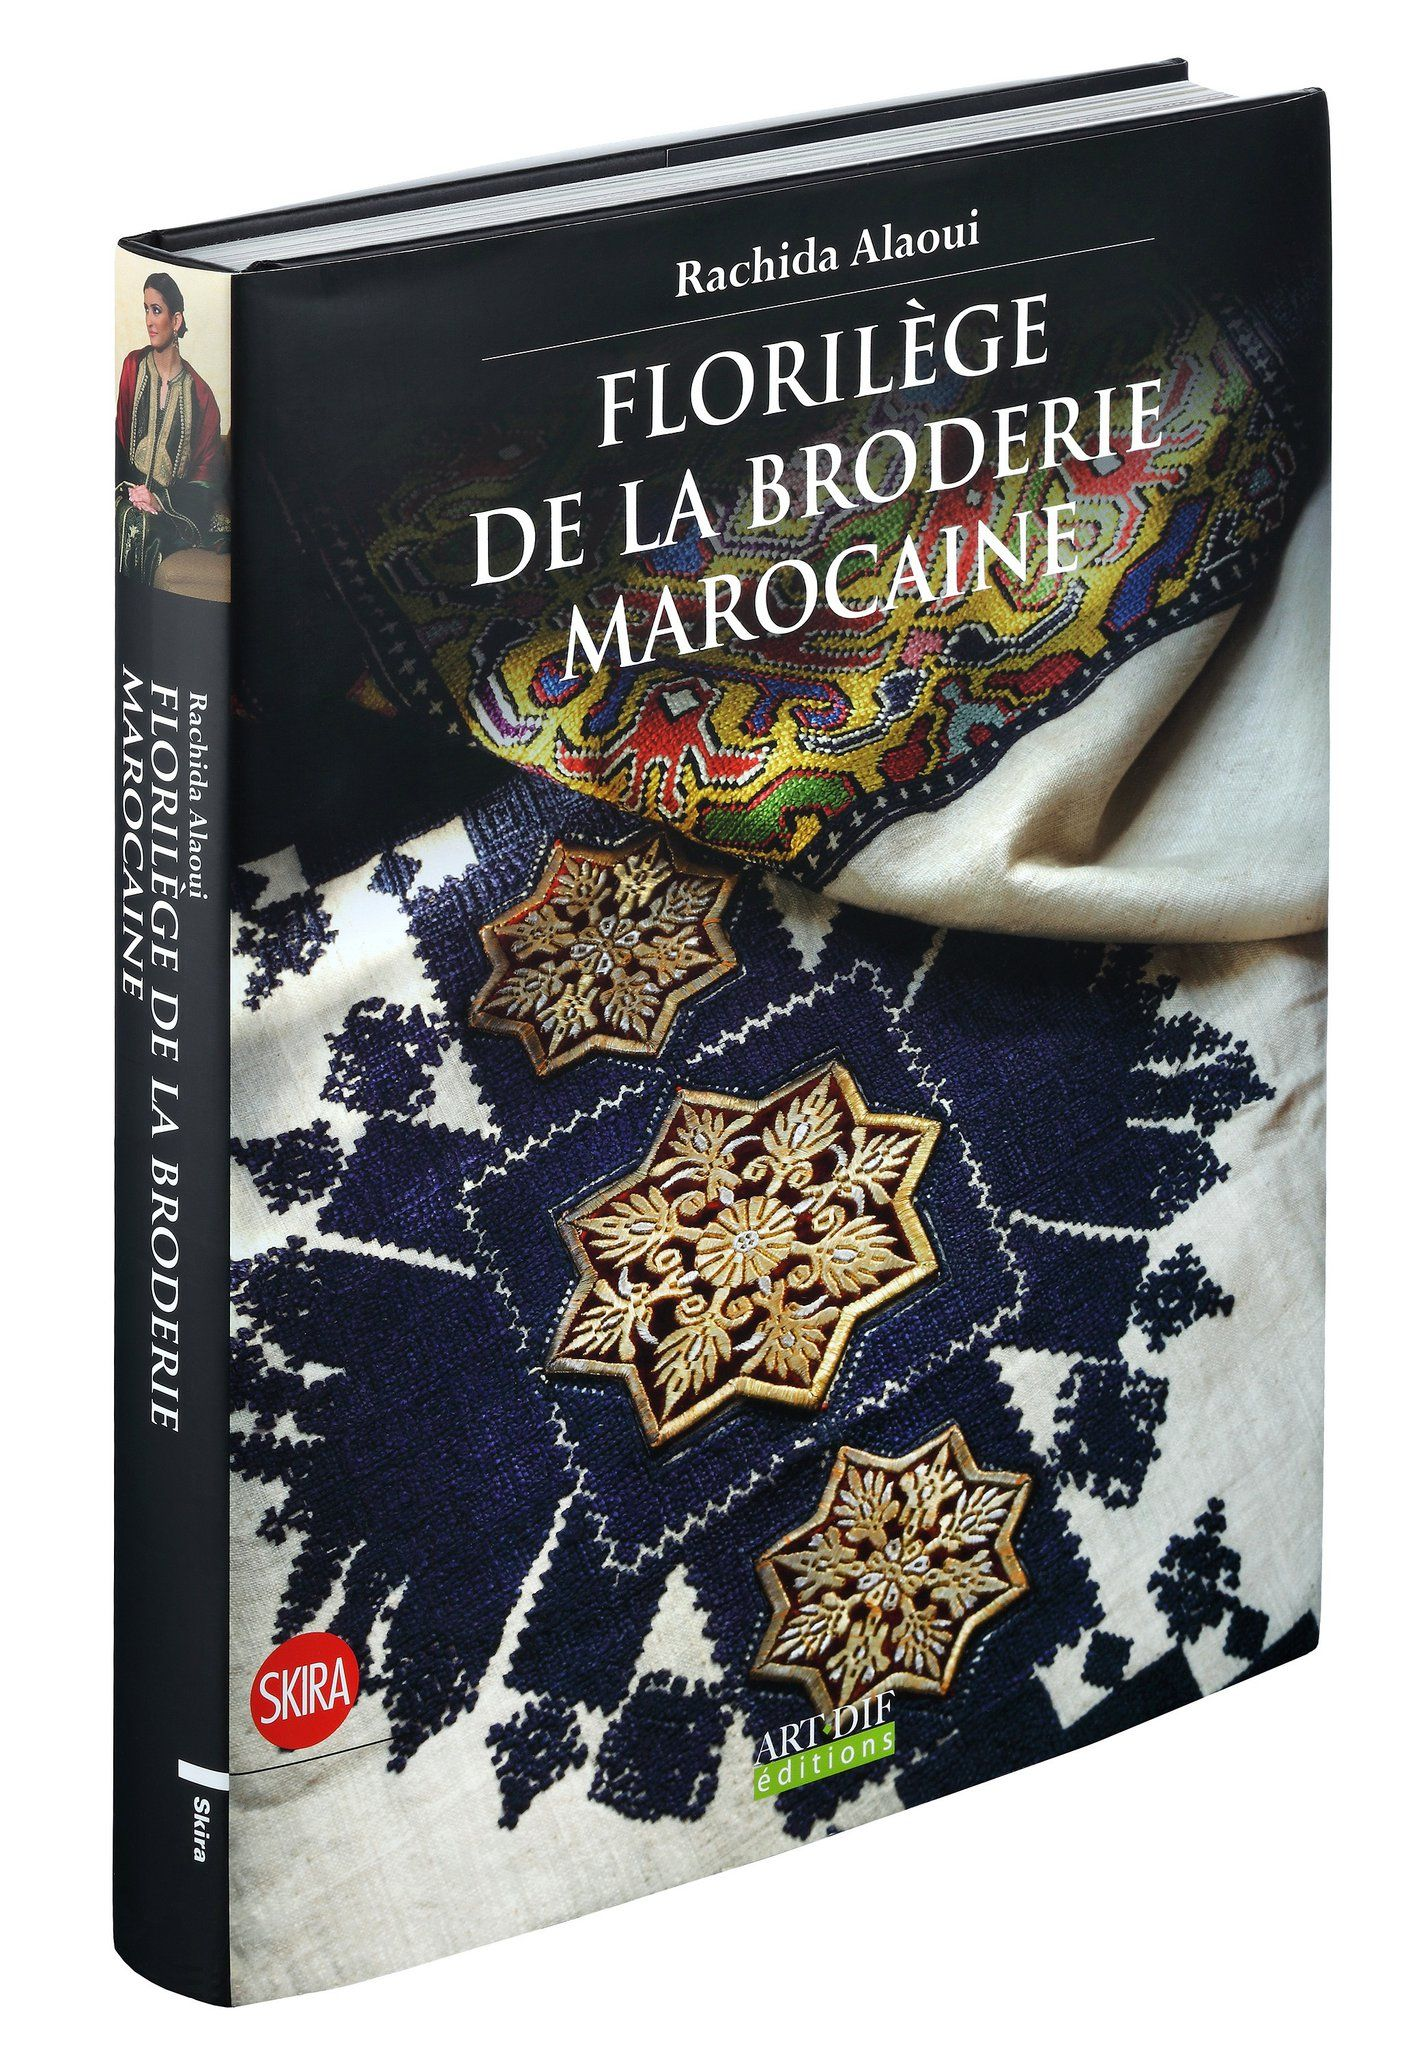 """Florilège de la broderie marocaine"" Skira édition, Italie, 2011."